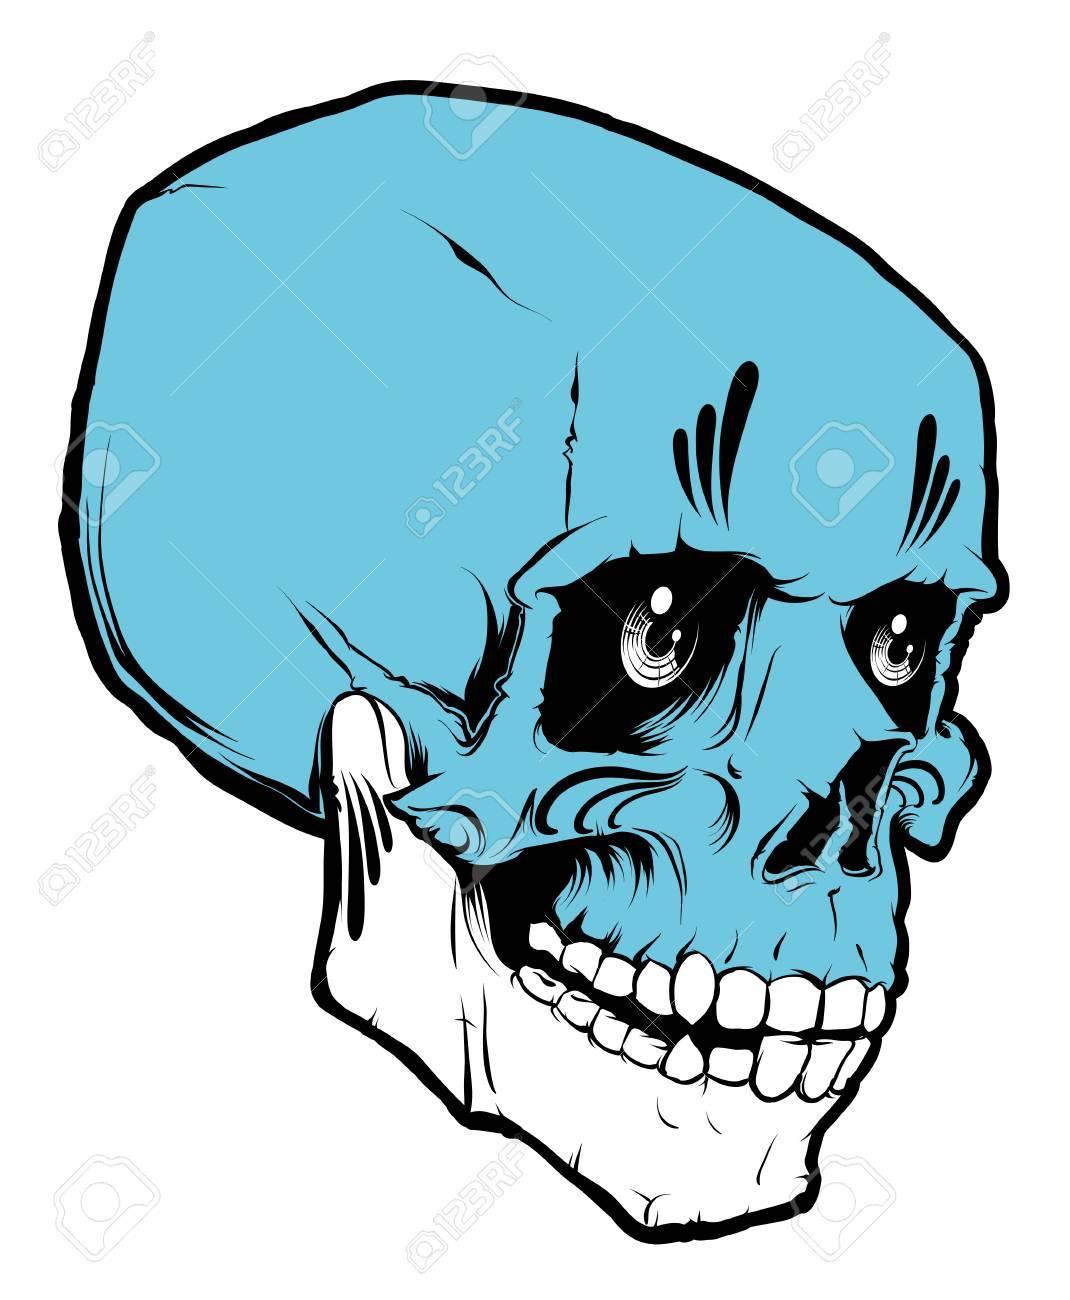 1070x1300 Voodoo Clipart Cool Skull